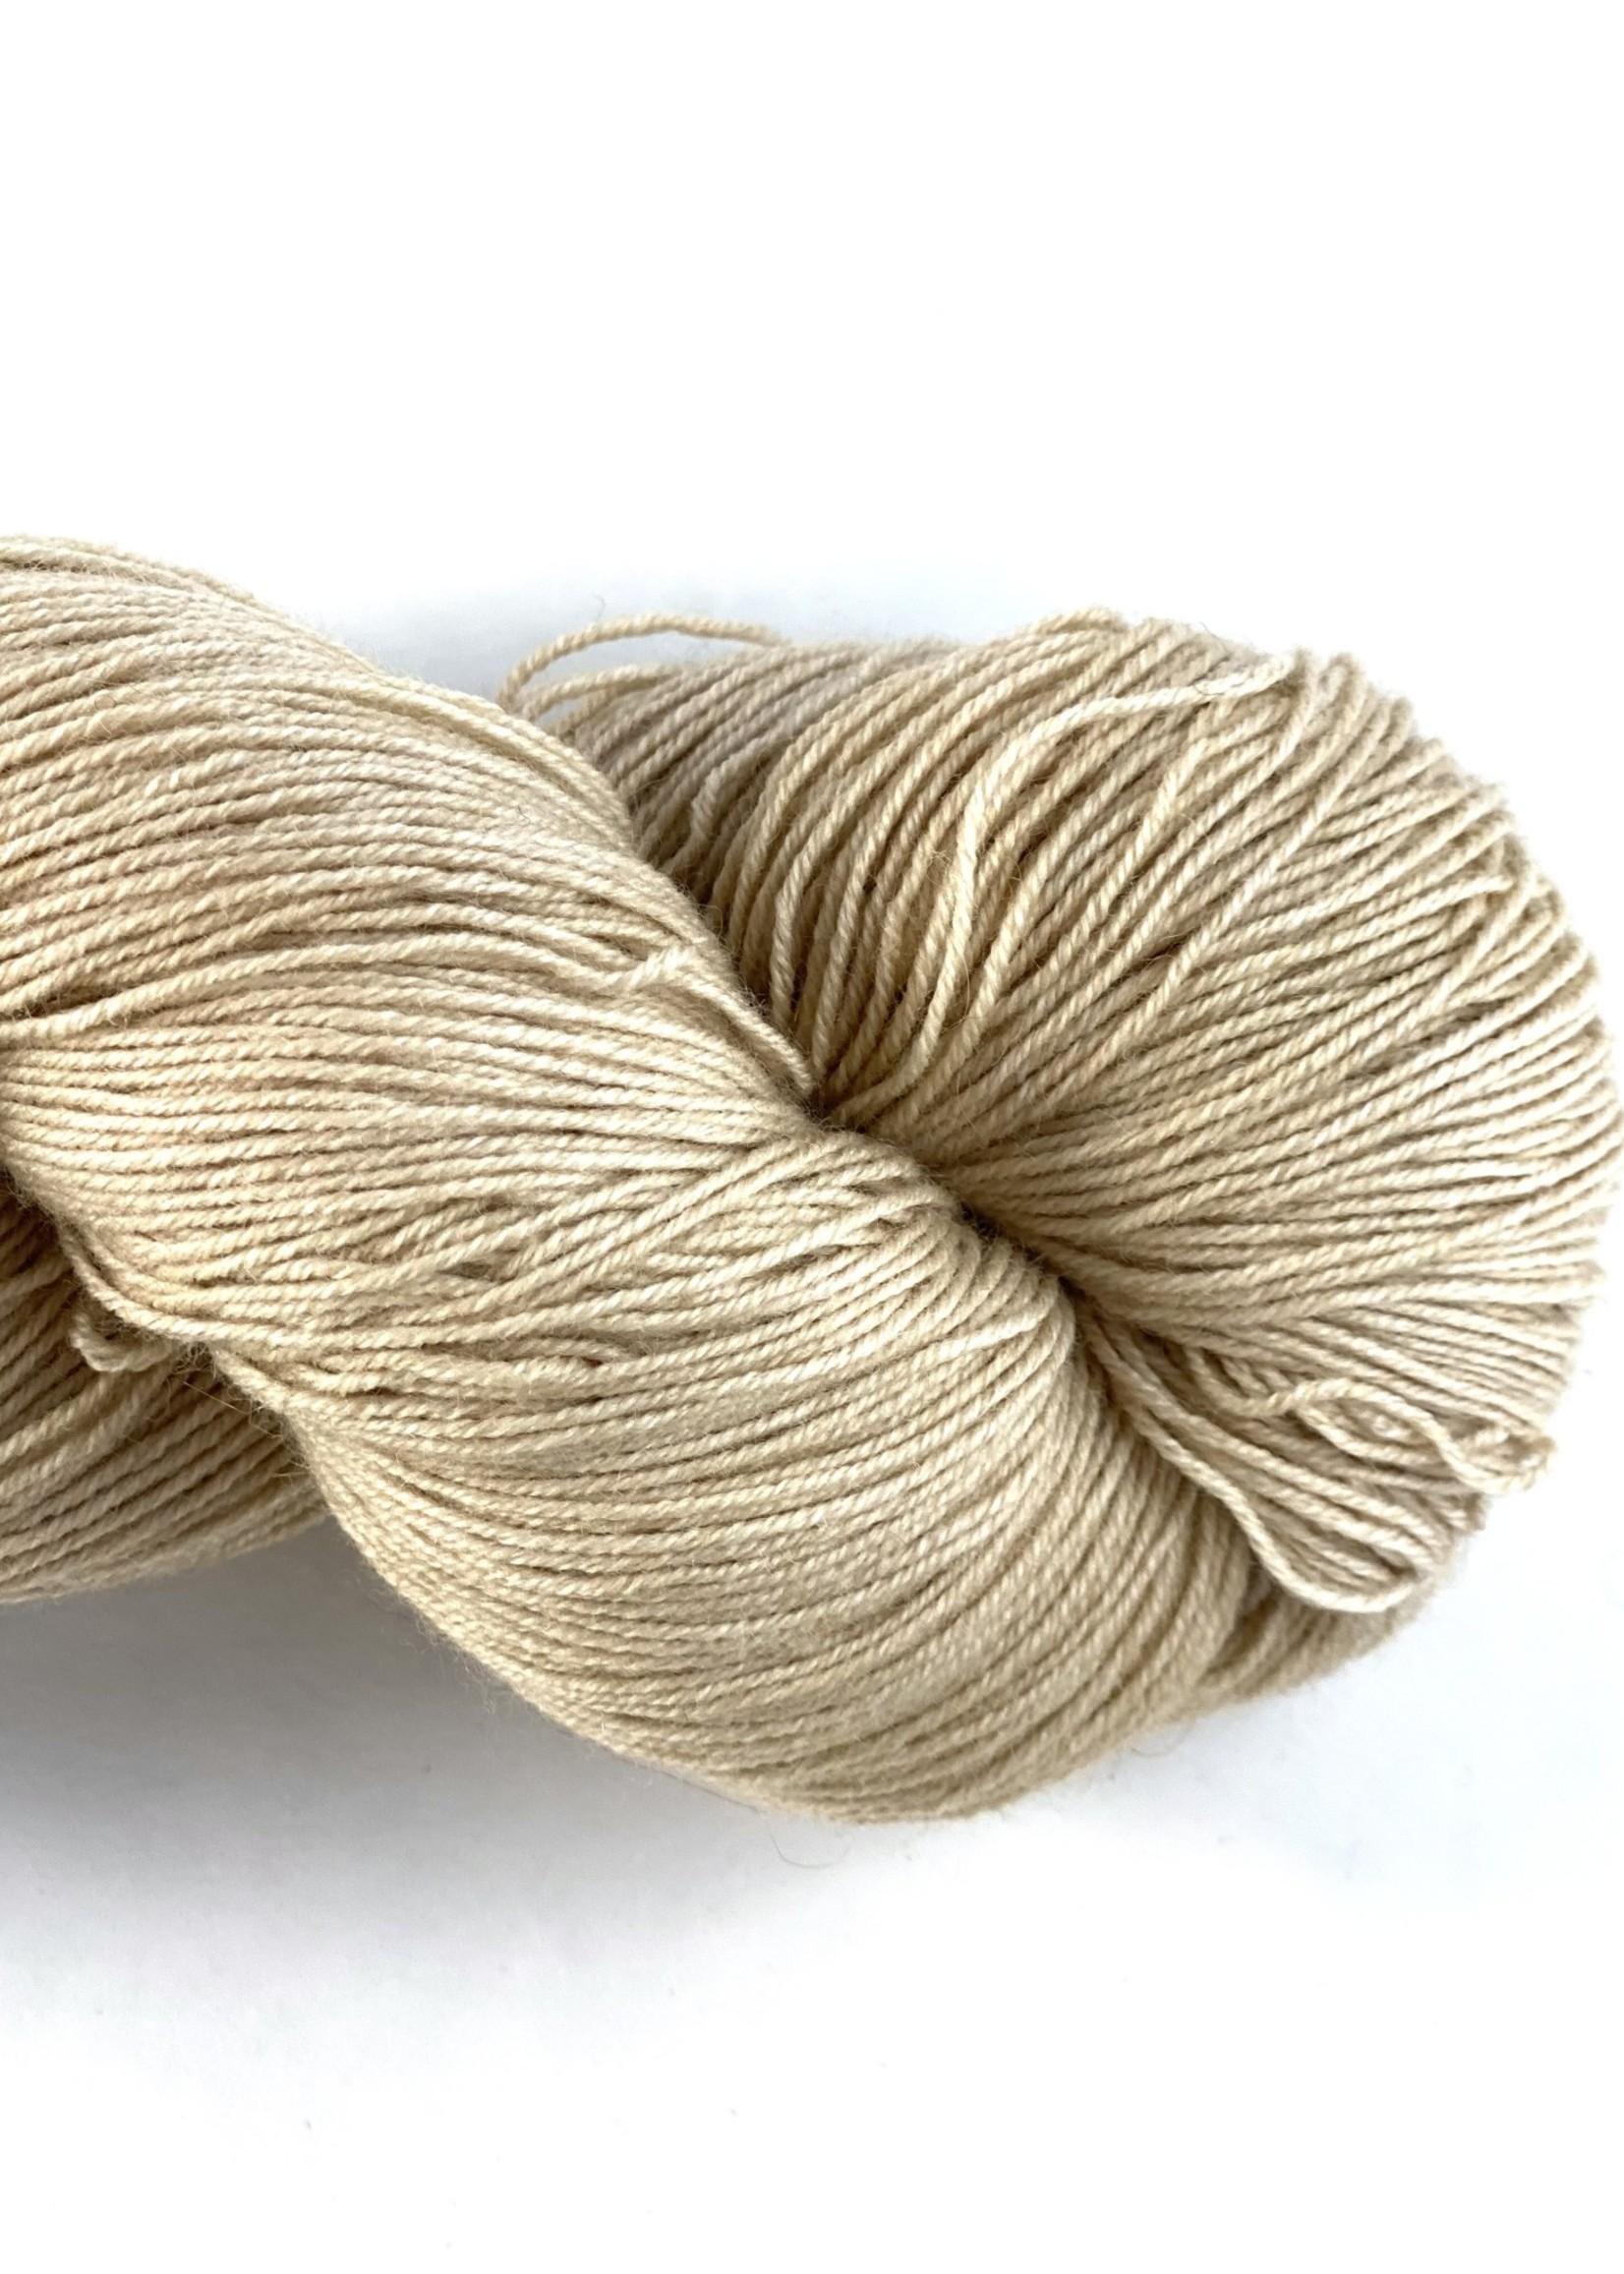 Handmaiden Fine Yarn Hand Maiden Merino Camel Lace Yarn Ivory